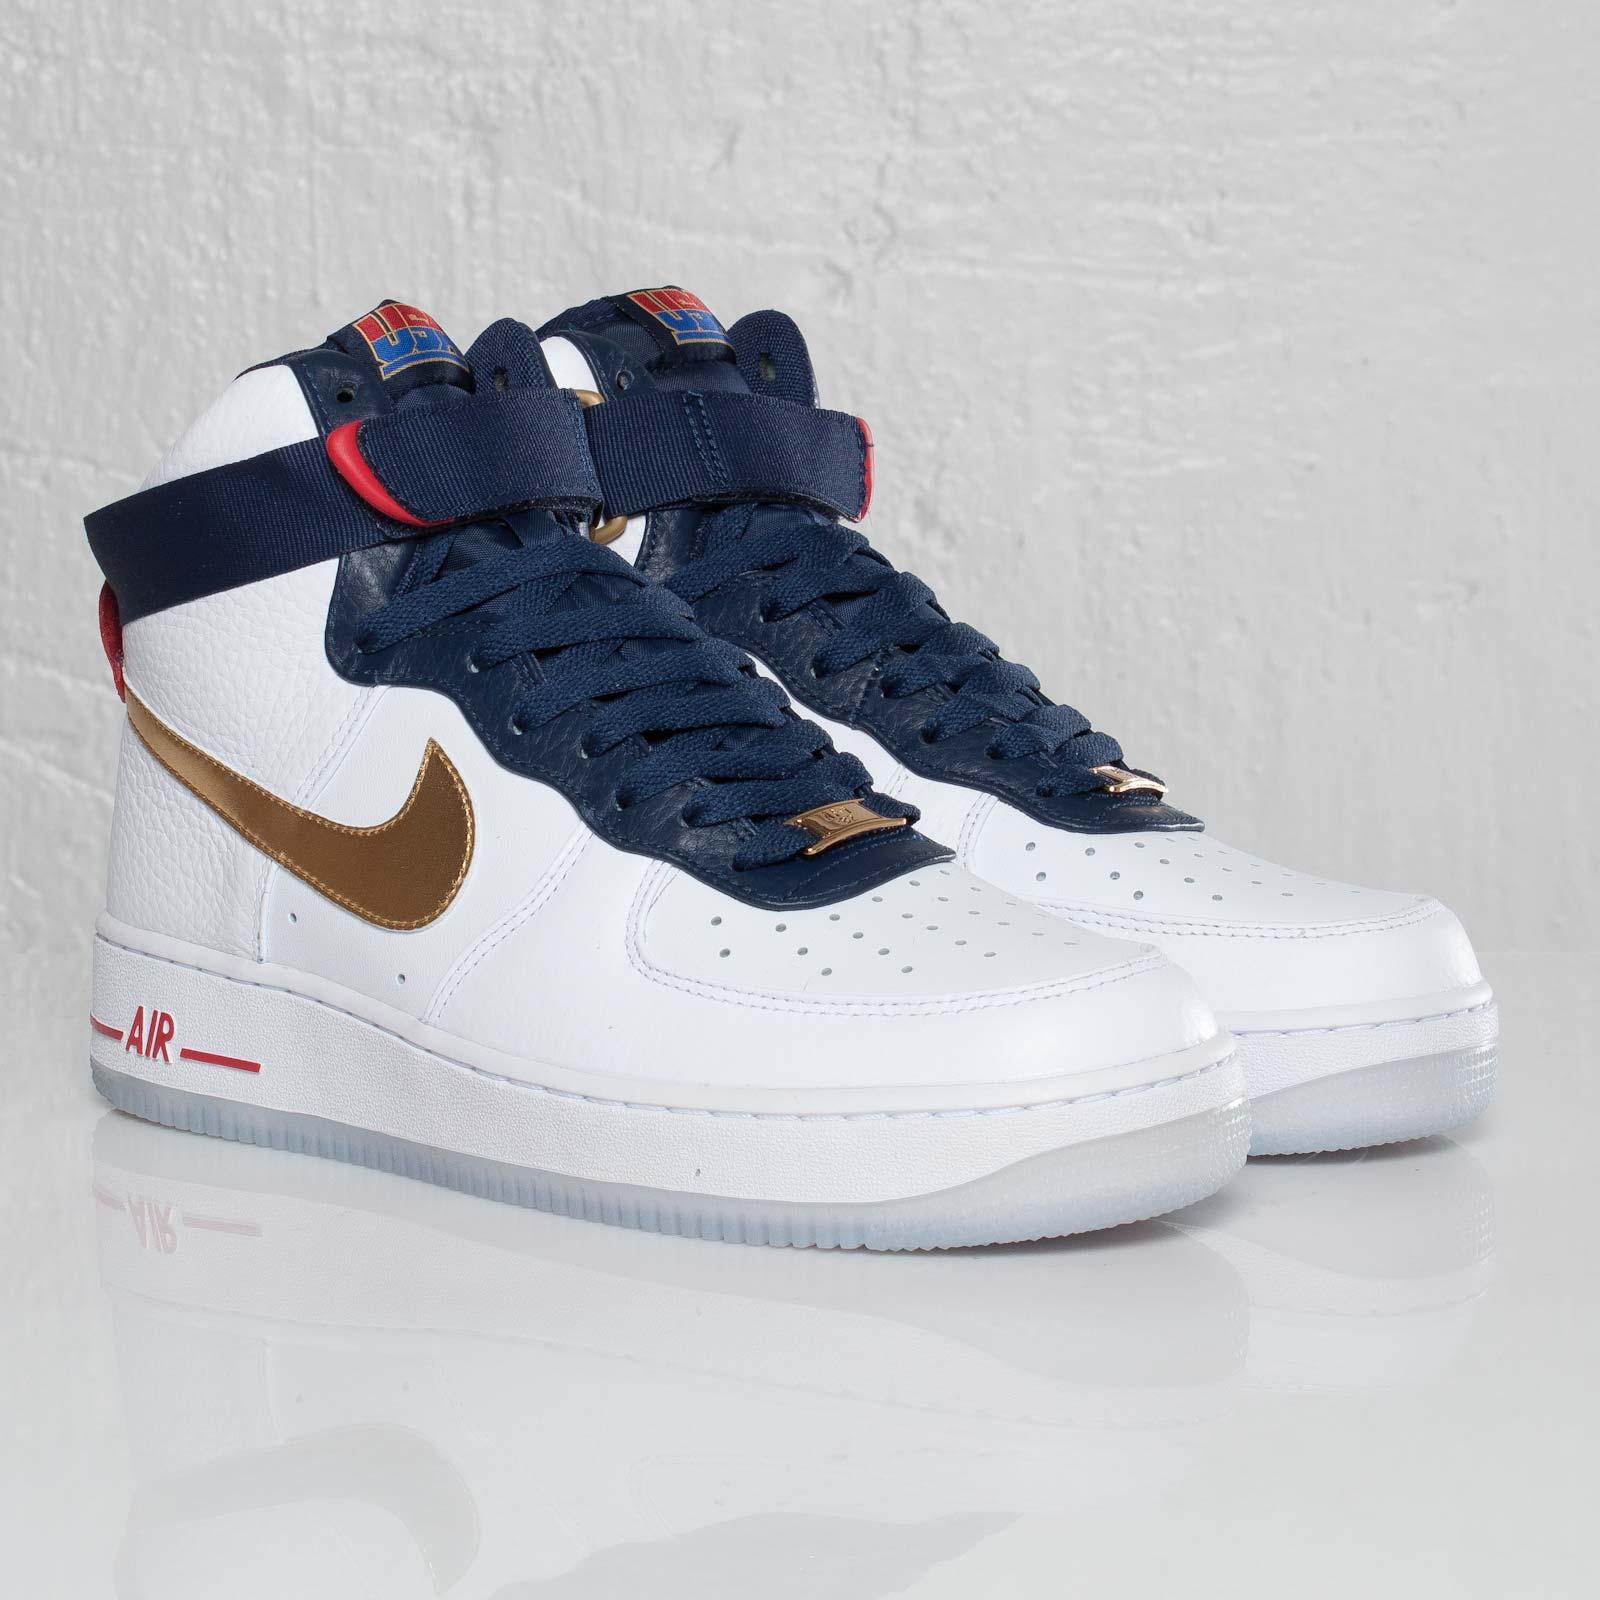 factory authentic 29d95 e0ef8 Nike Air Force 1 HI ´07 Premium